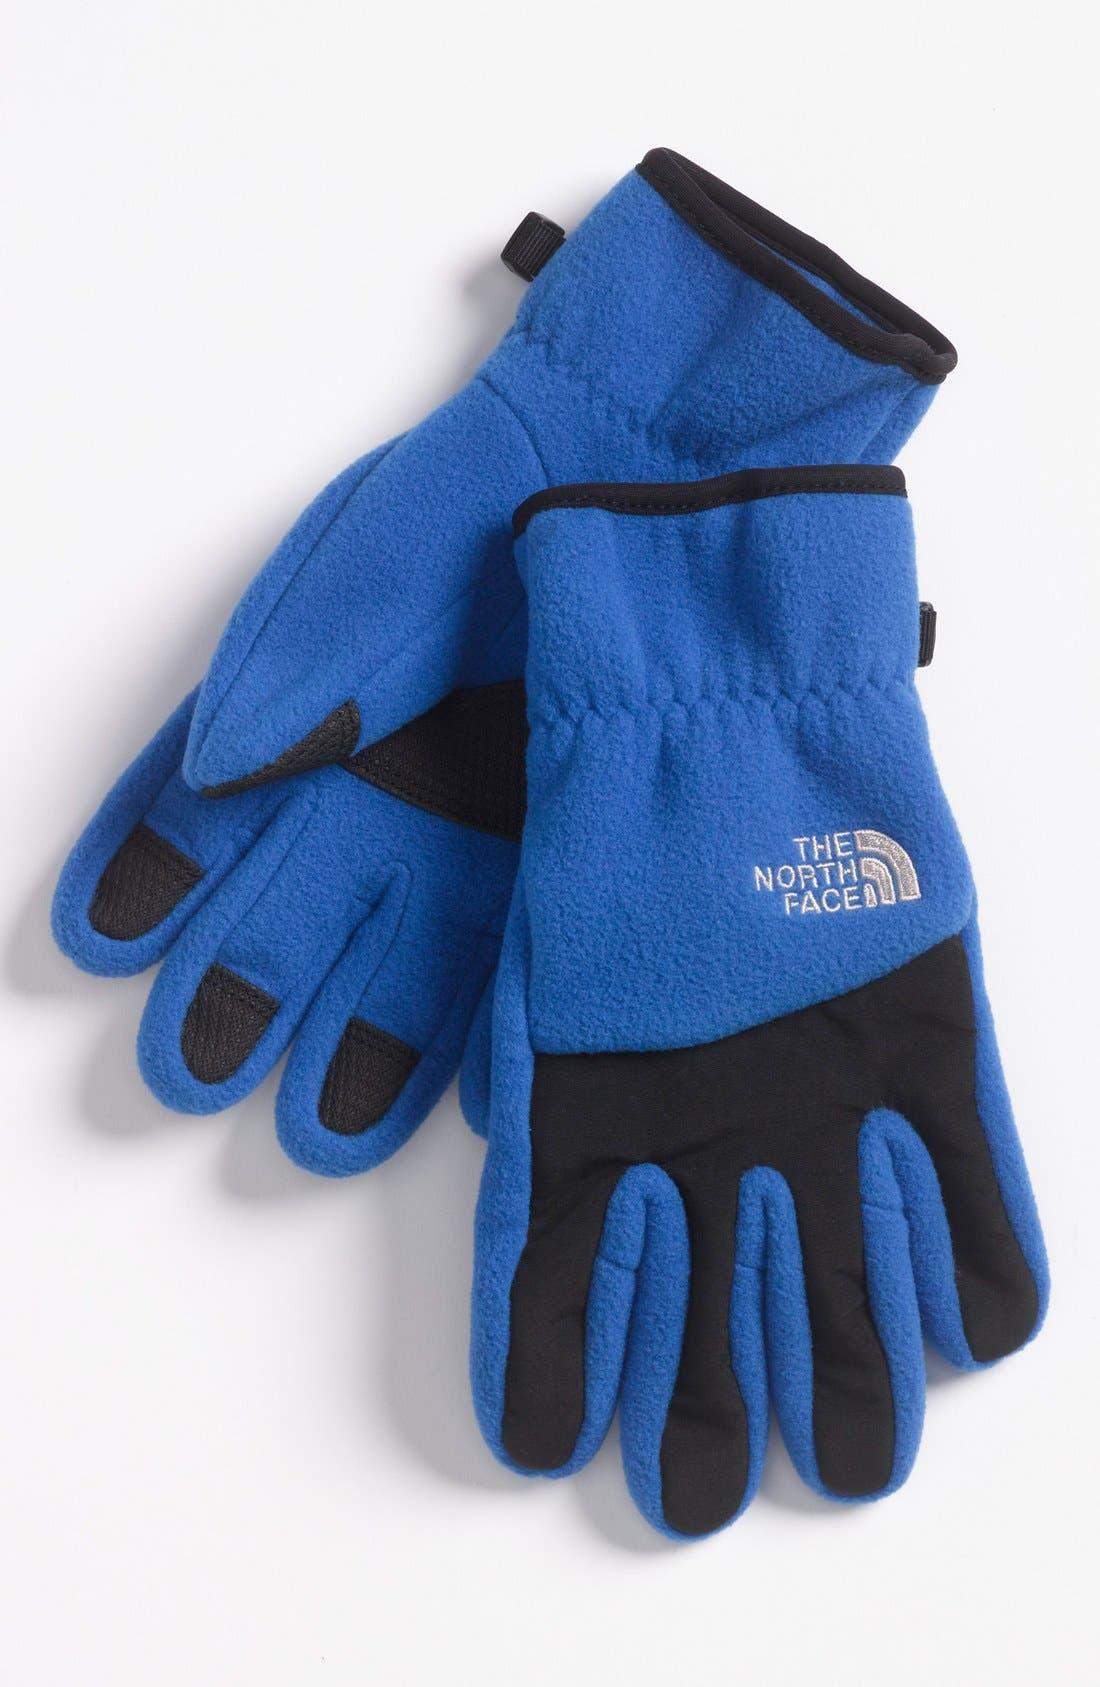 Main Image - The North Face 'Denali' Gloves (Boys)